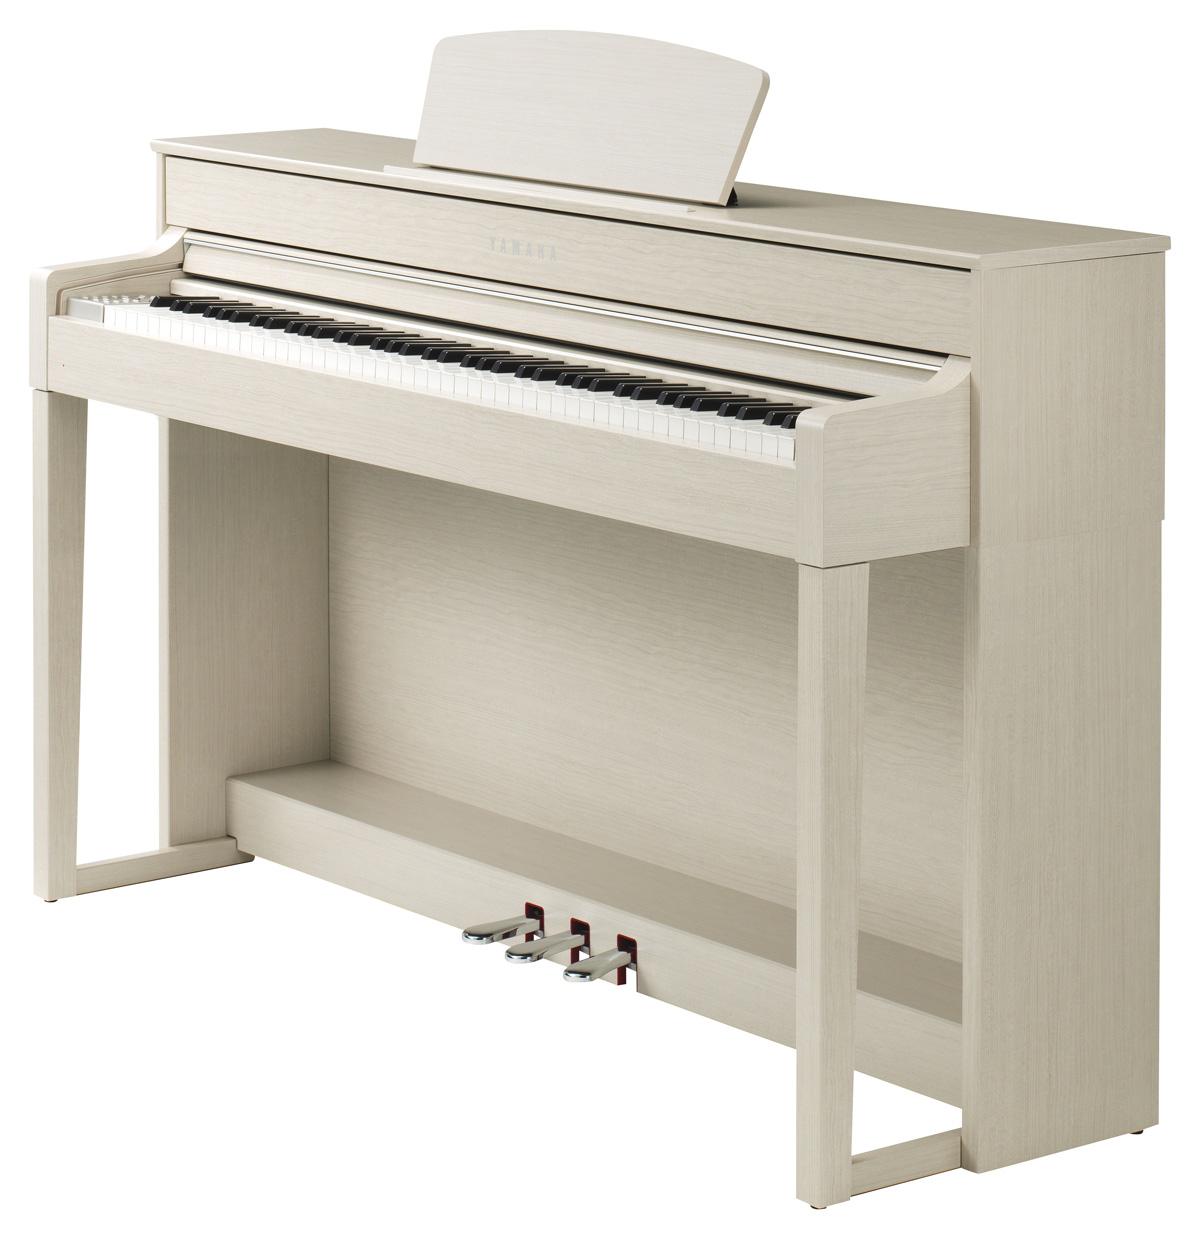 yamaha clp 535 clavinova digital piano in white ash finish yamaha music london. Black Bedroom Furniture Sets. Home Design Ideas